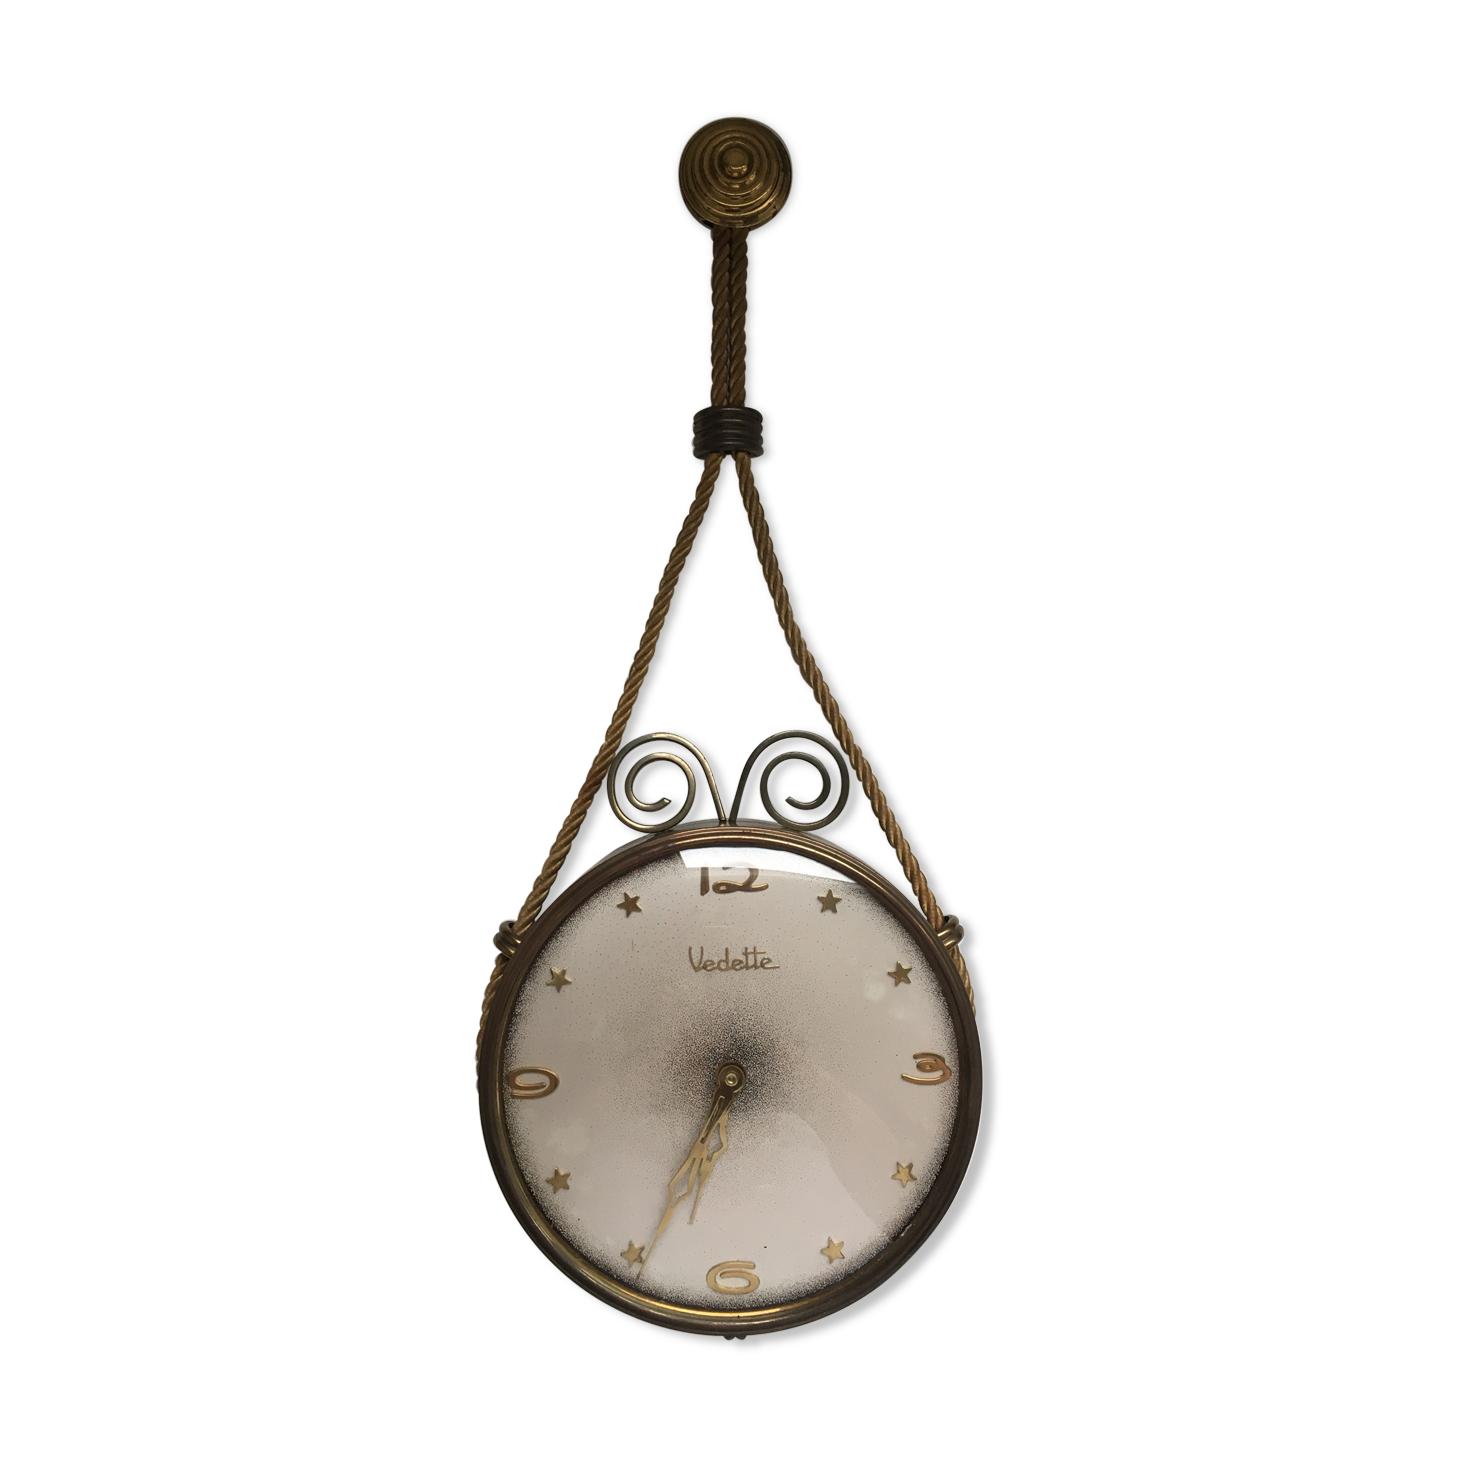 Horloge murale Vedette étoiles